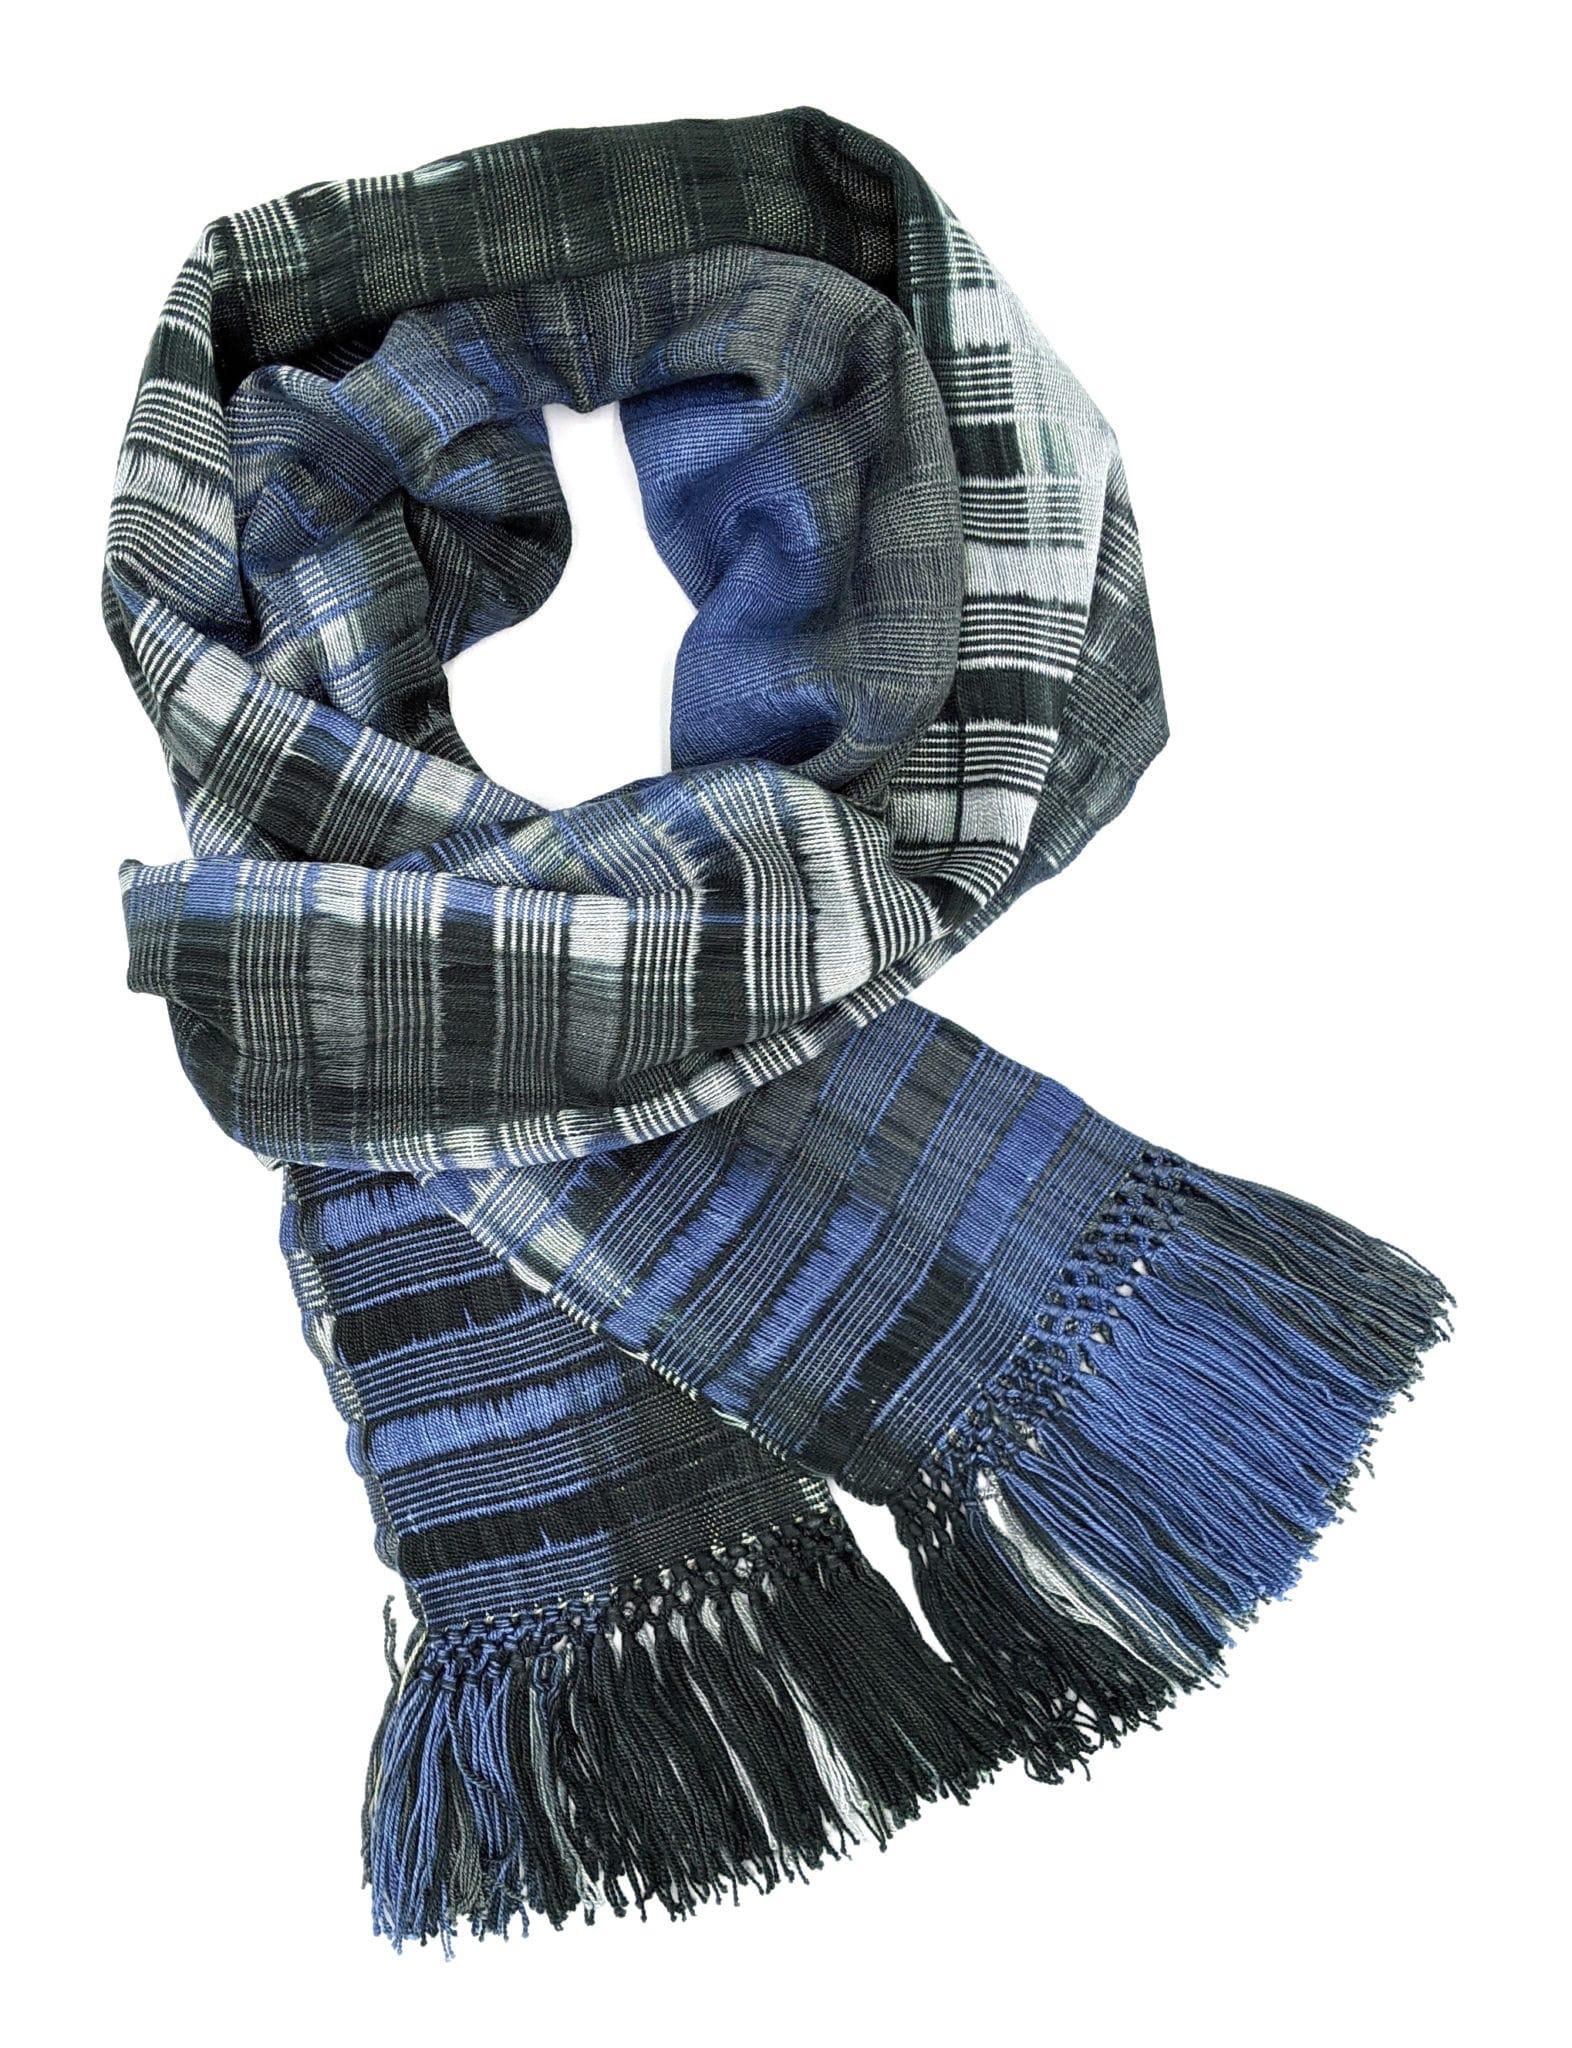 Blue, Grays, Black - Lightweight Bamboo Open-Weave Handwoven Scarf 8 x 68